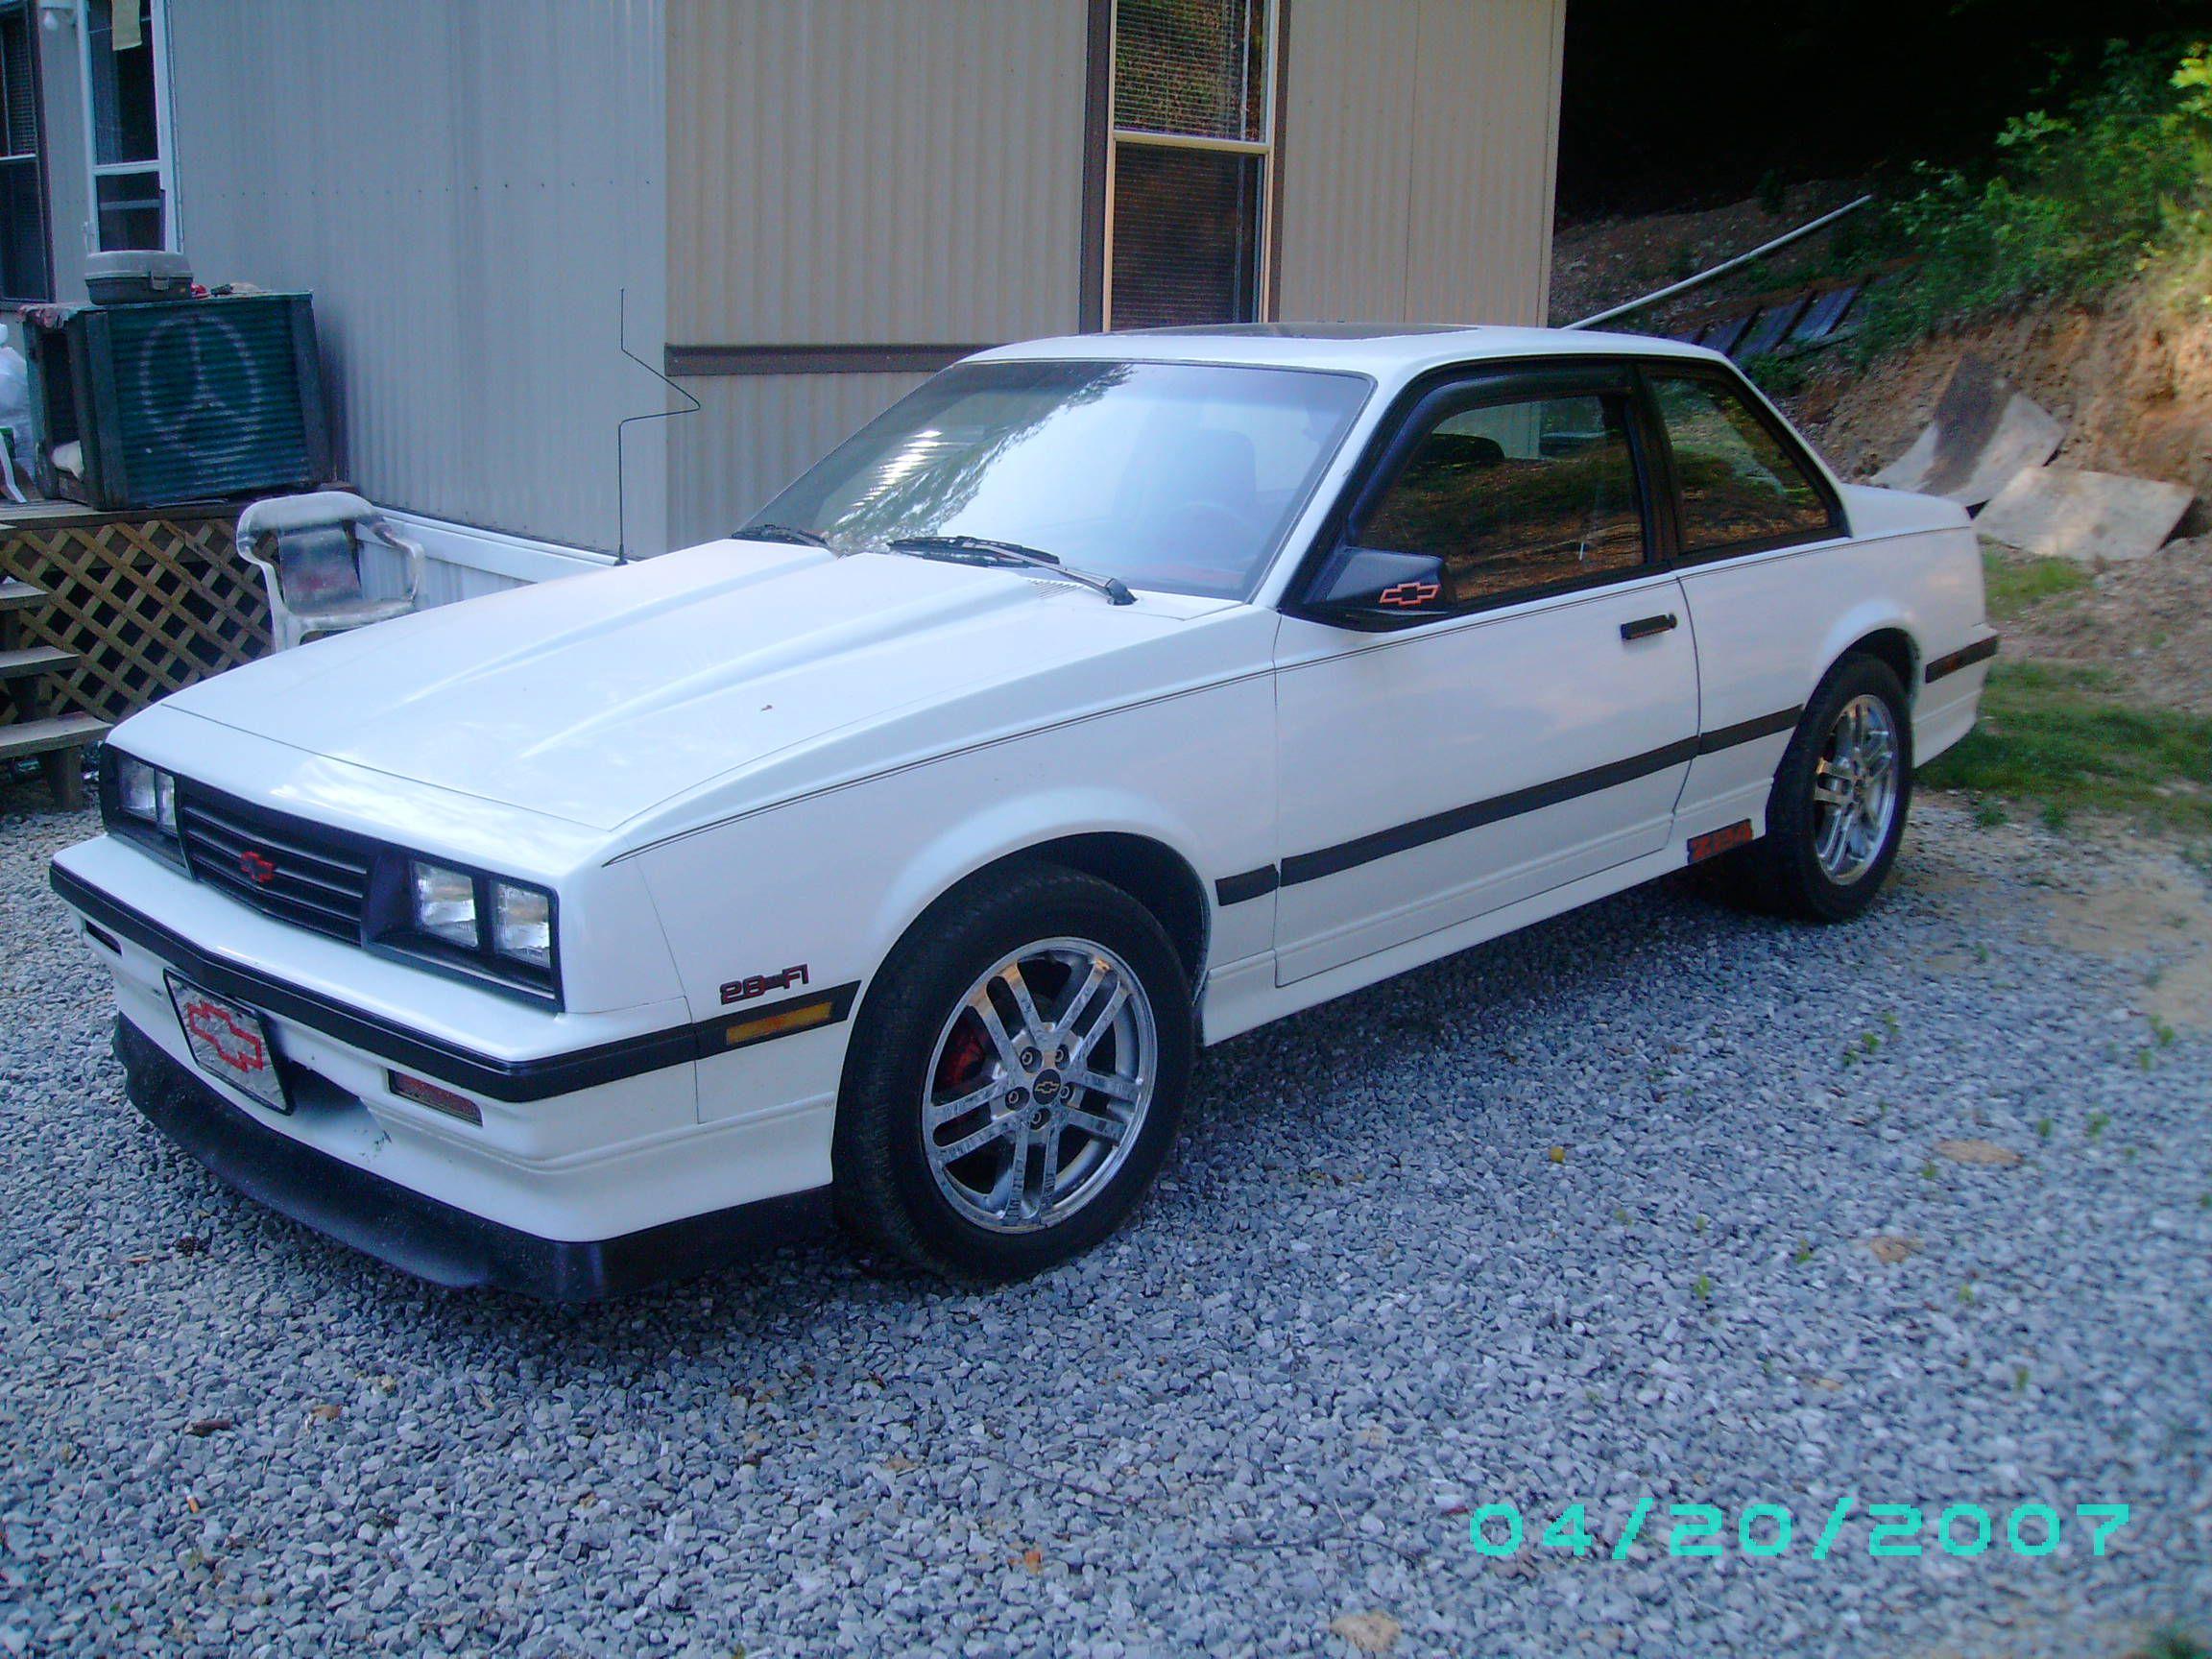 medium resolution of white 1986 chevy cavalier z24 my 2nd car